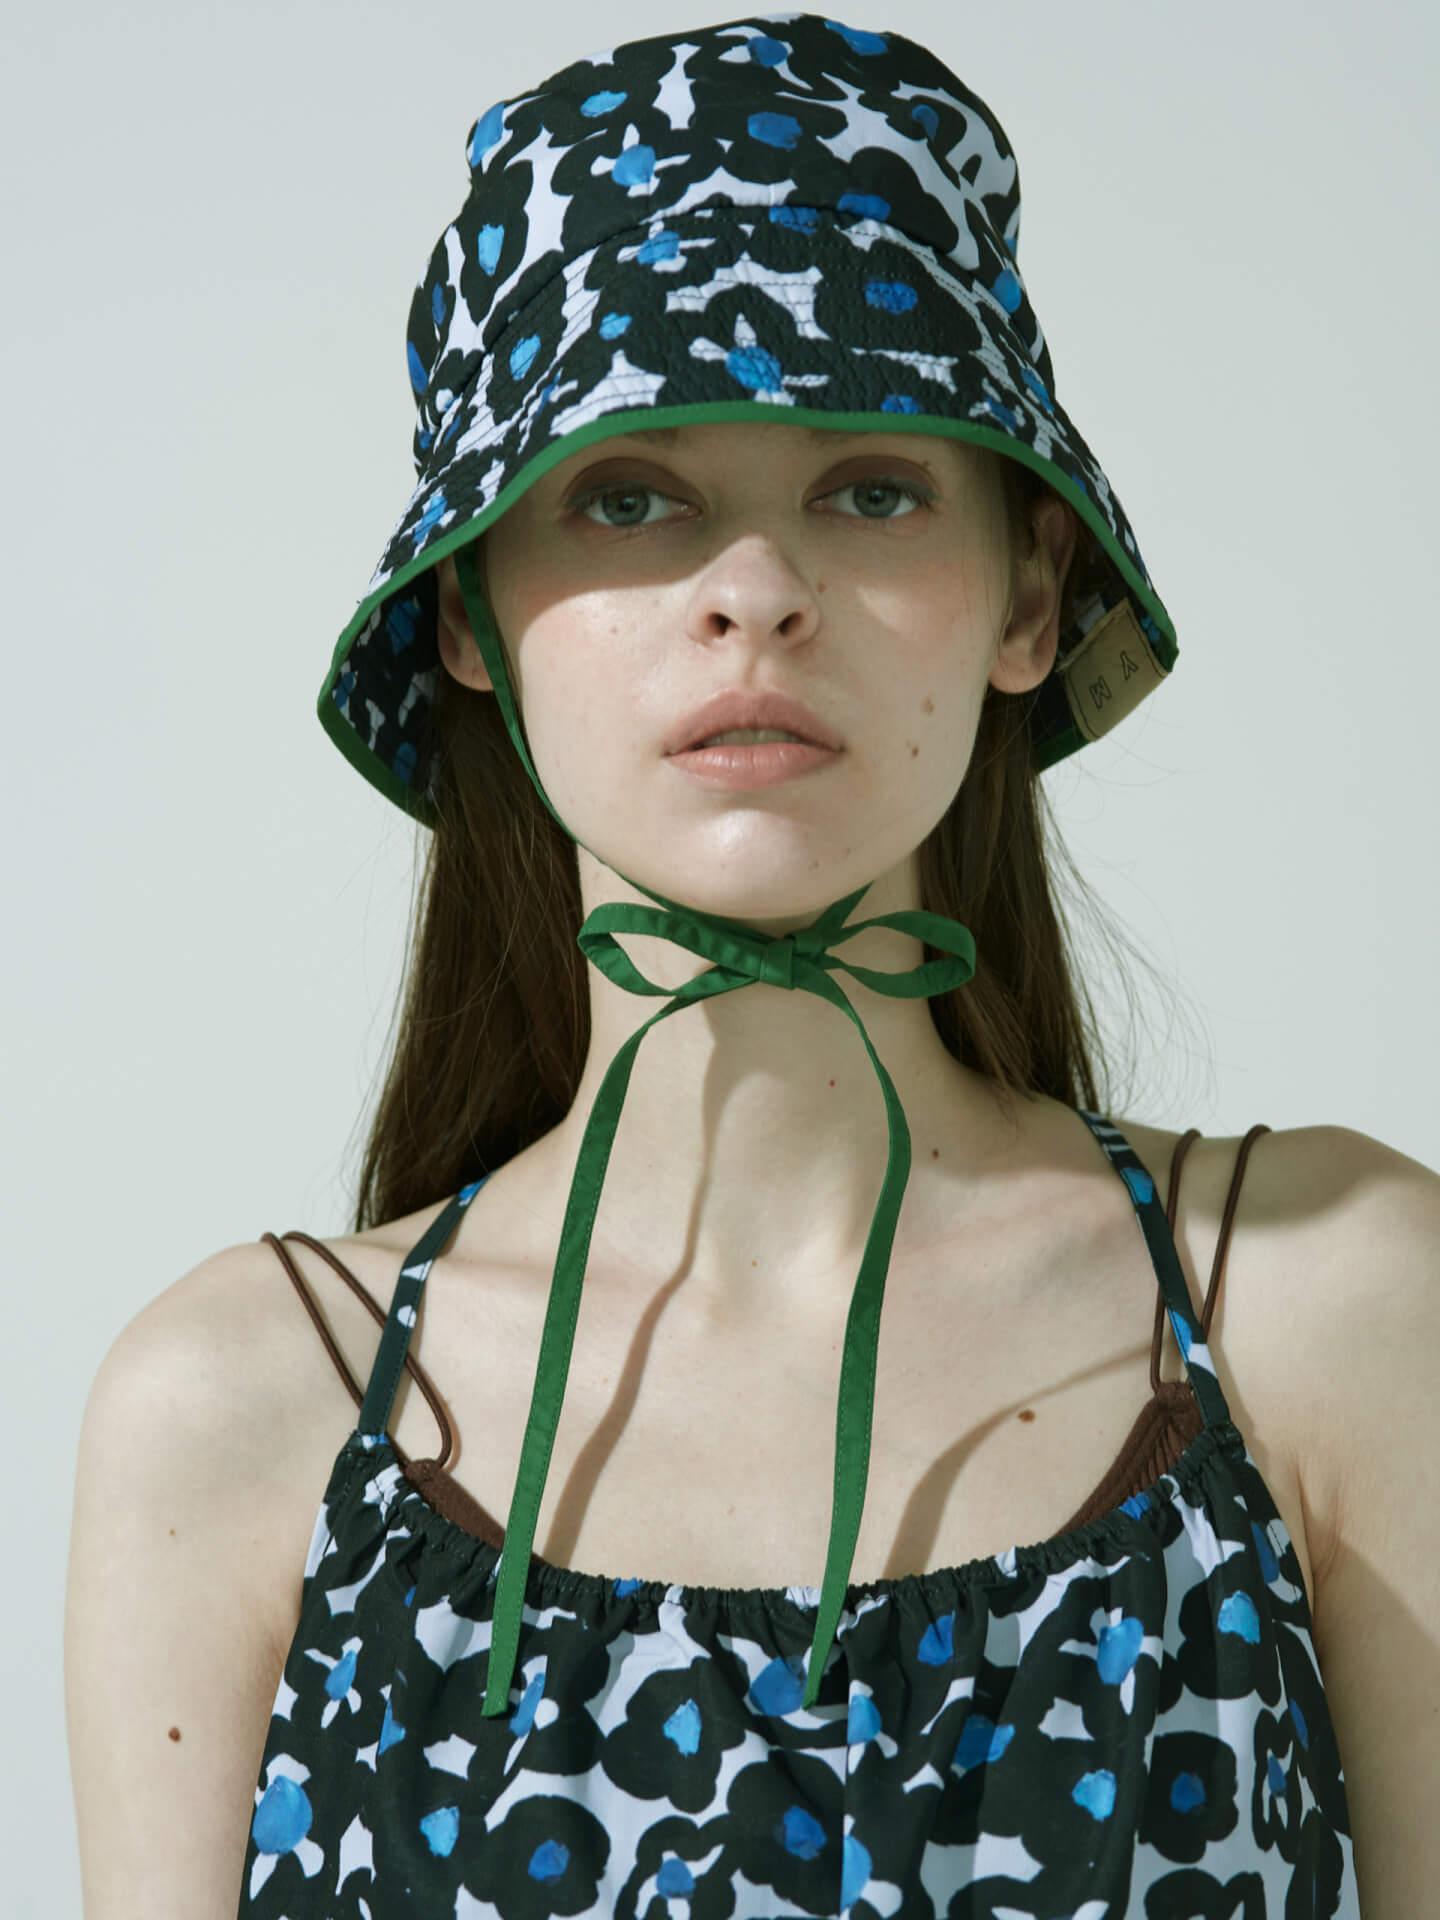 CHAIのベーシスト・YUUKIによるプロジェクト「YMYM」よりファッションブランドオープン!2021年春夏コレクション&描き下ろし絵画などの展示会も life210405_ymym_15